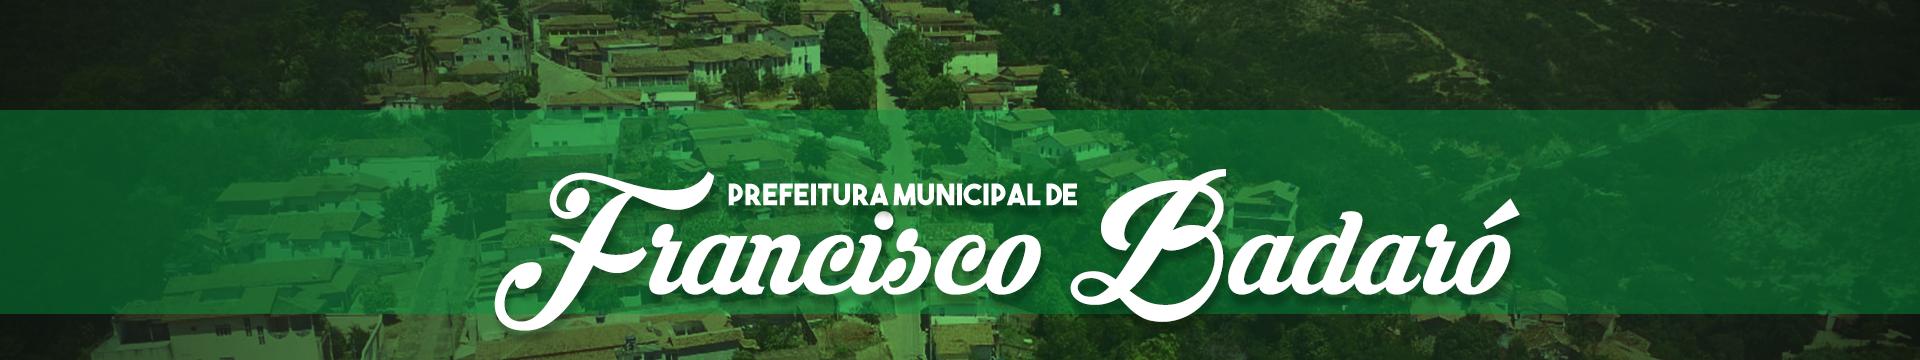 Prefeitura Municipal de Francisco Badaró